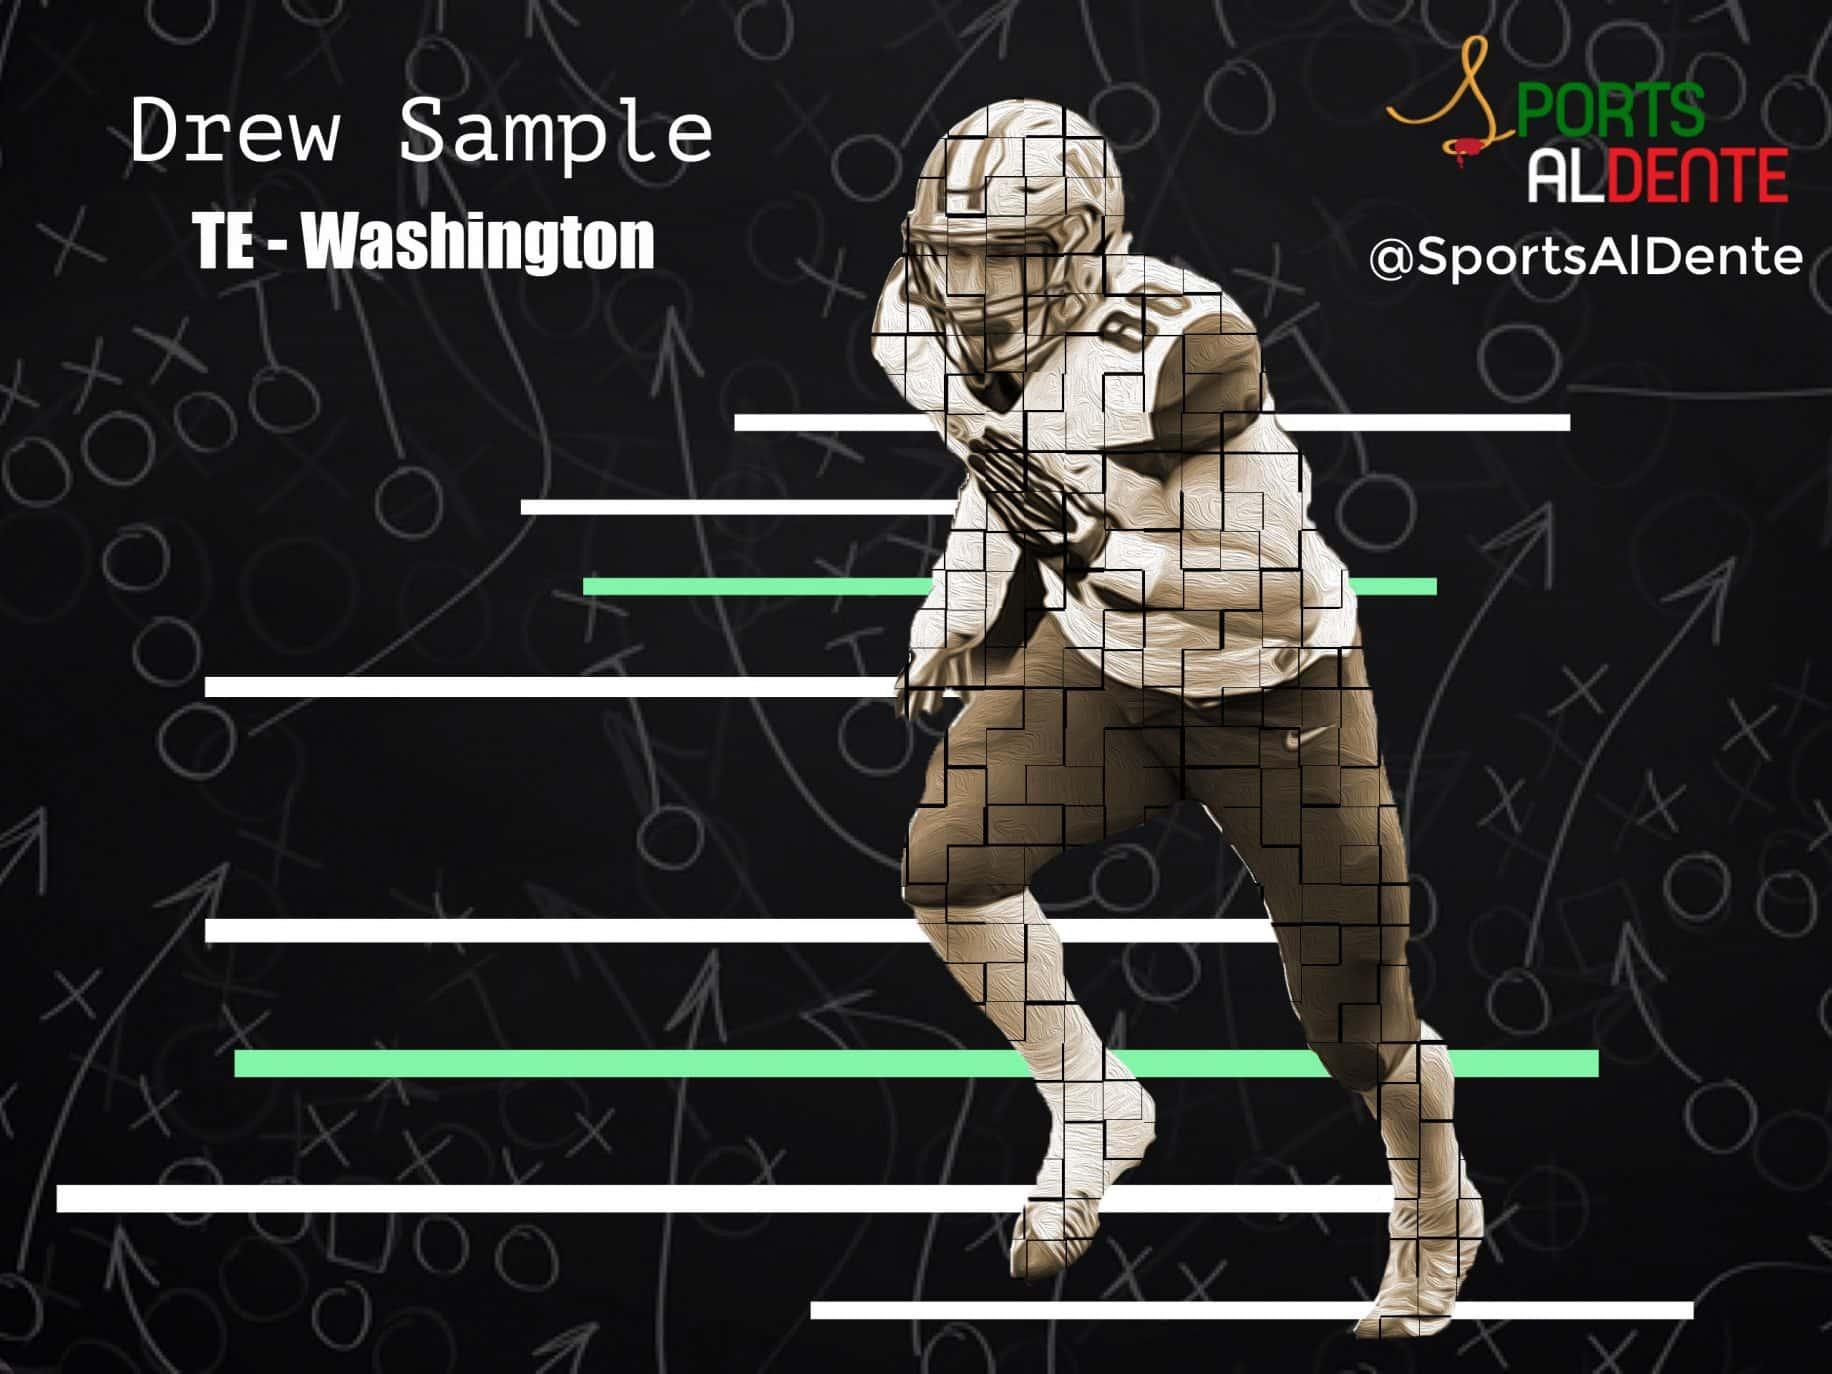 Drew Sample NFL Draft Profile